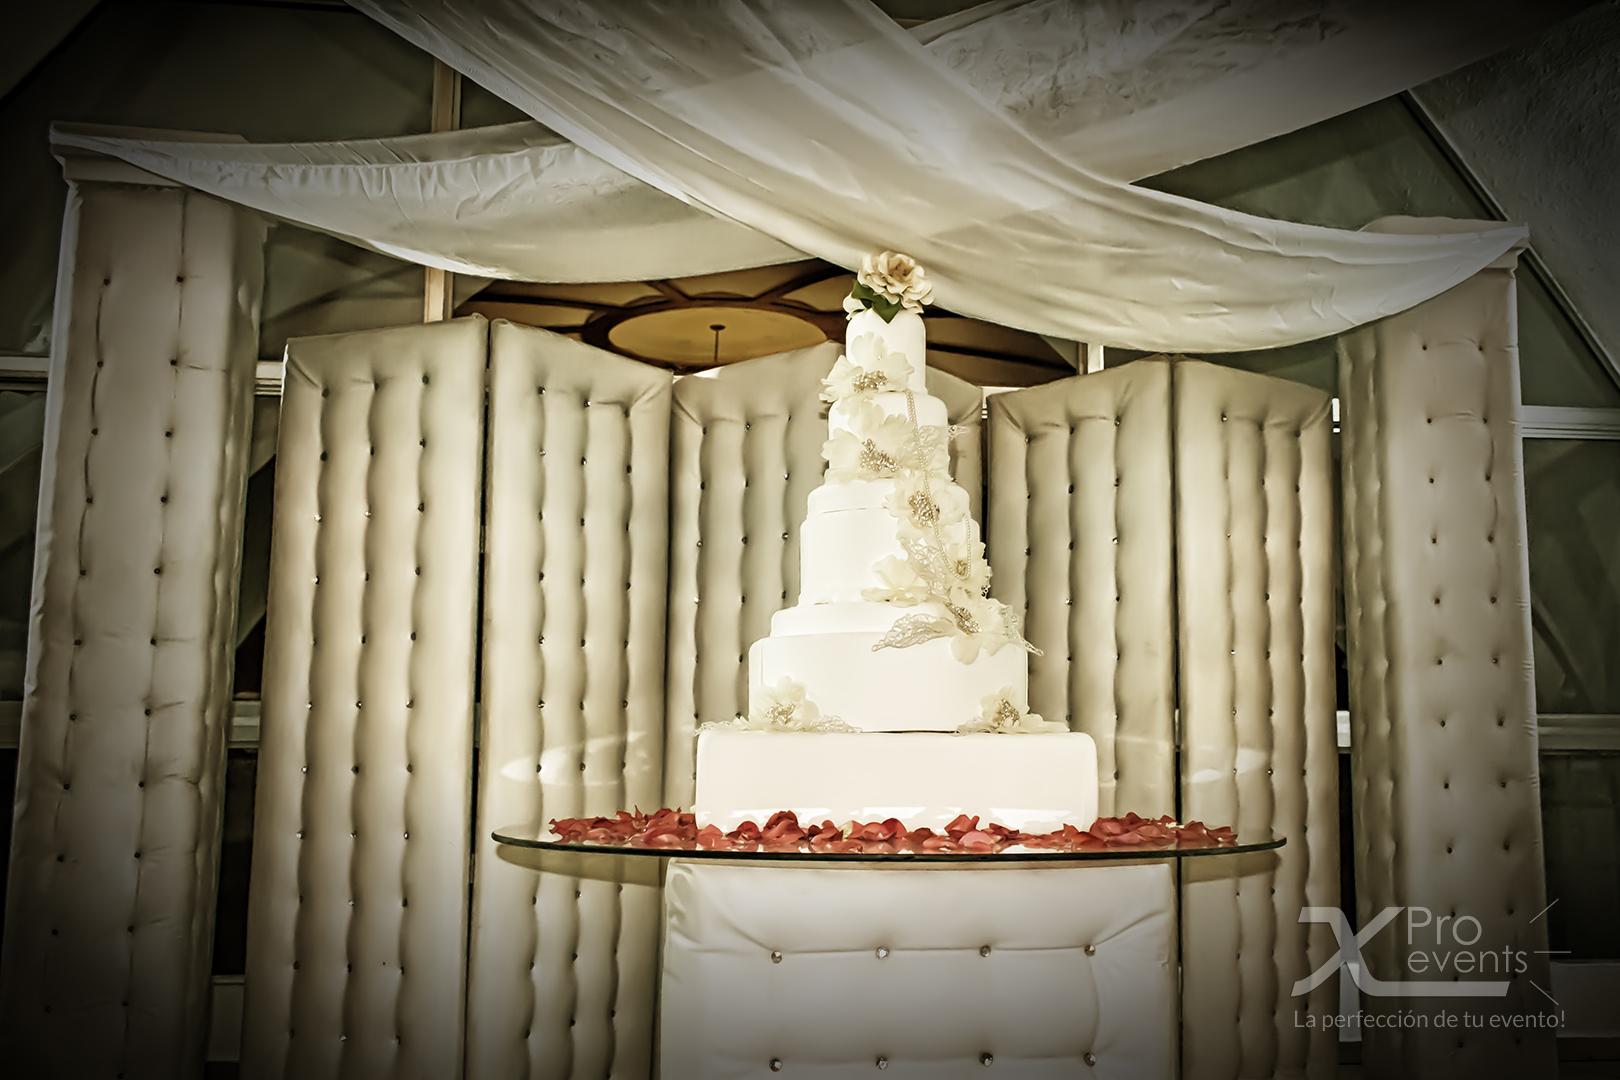 www.Xproevents.com - Bizcocho de boda retocado.jpg